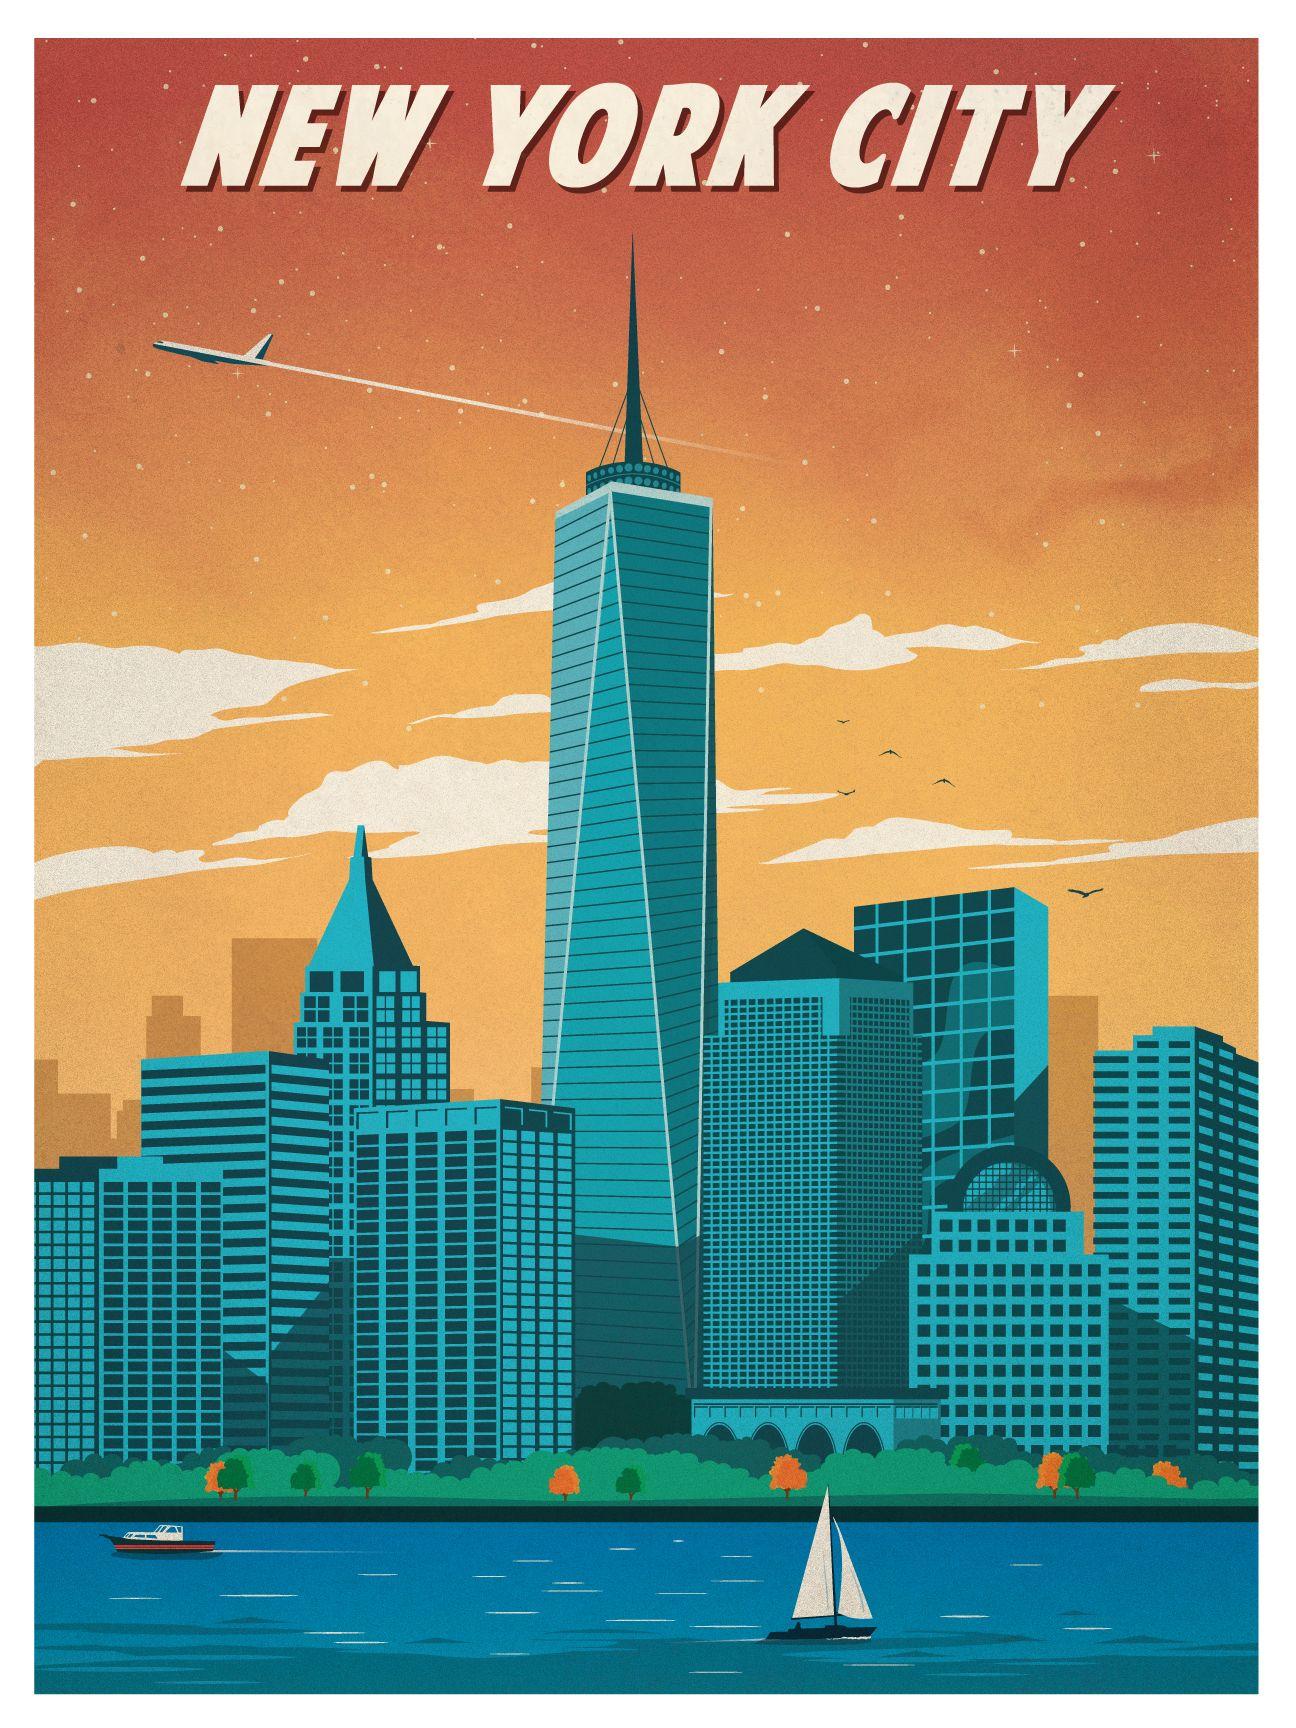 Vintage Travel Posters, Travel